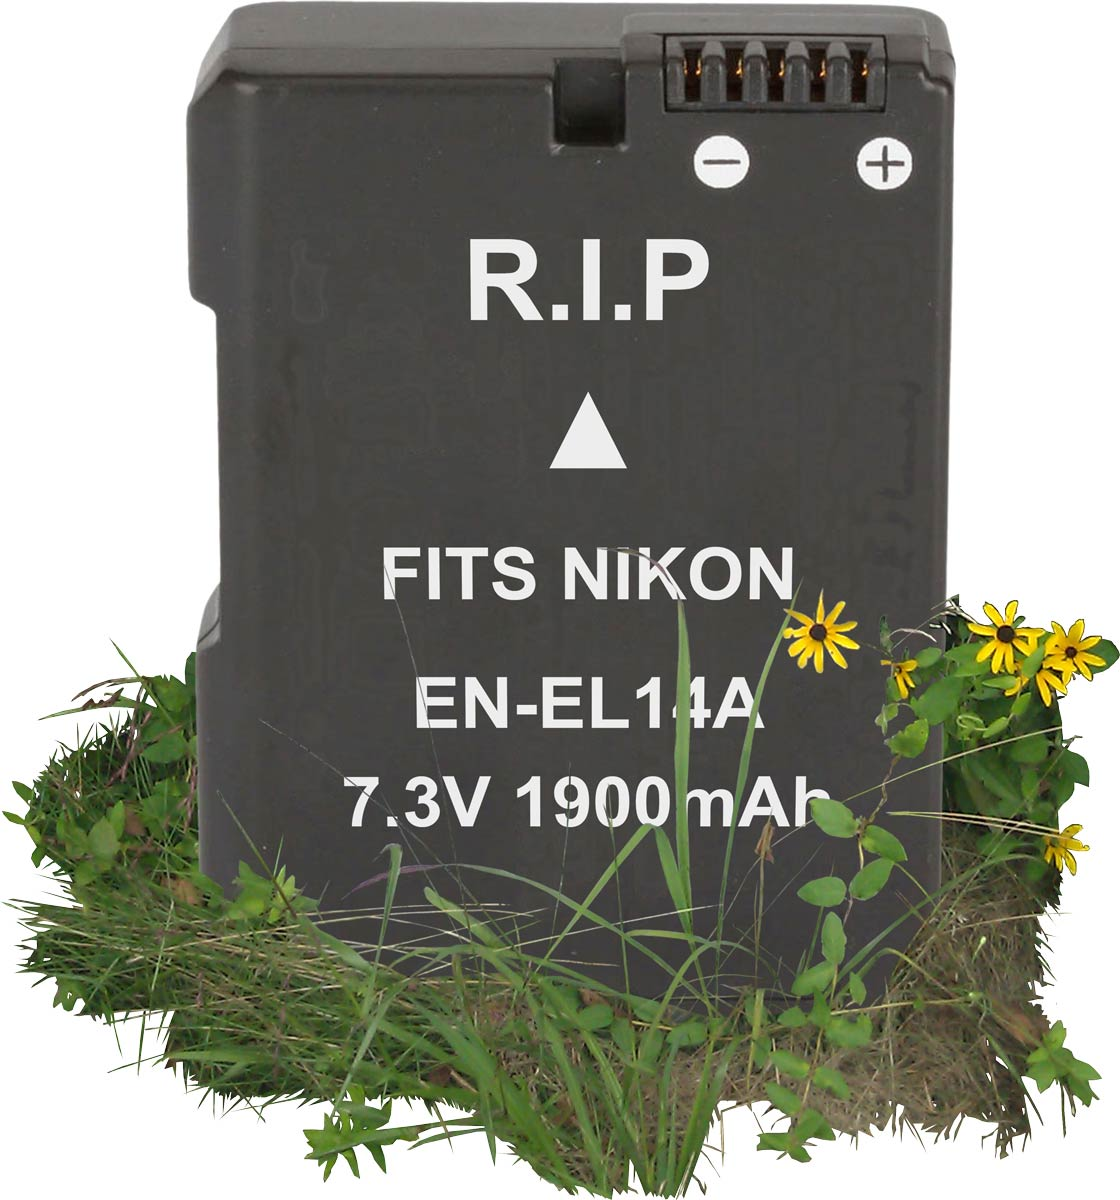 Dead Battery: 3rd party EN-EL14A